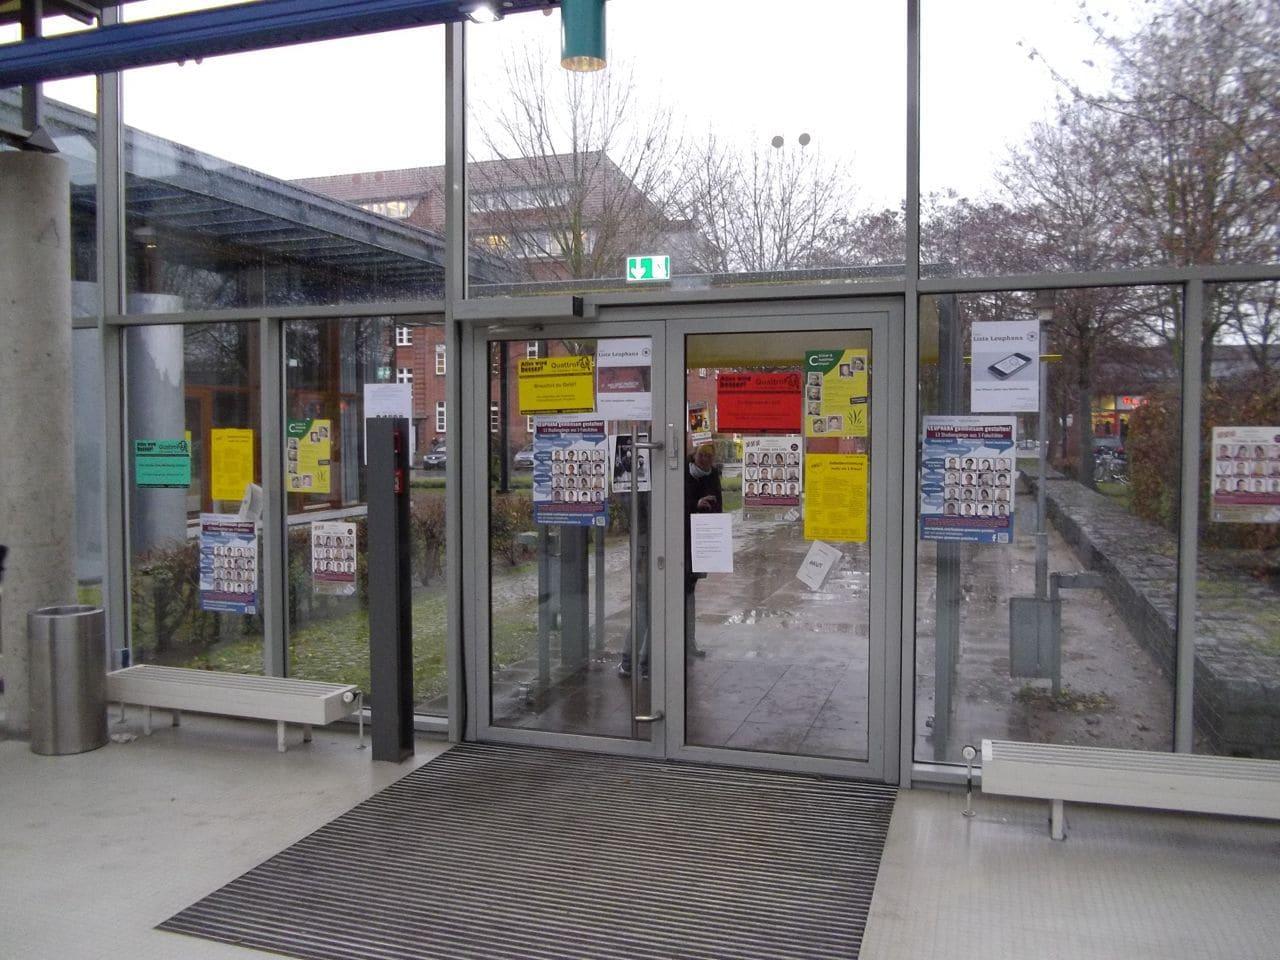 Beklebte Fenster mit Wahlwerbung im Hörsaalgang/(CC)Foto:Christopher Bohlens